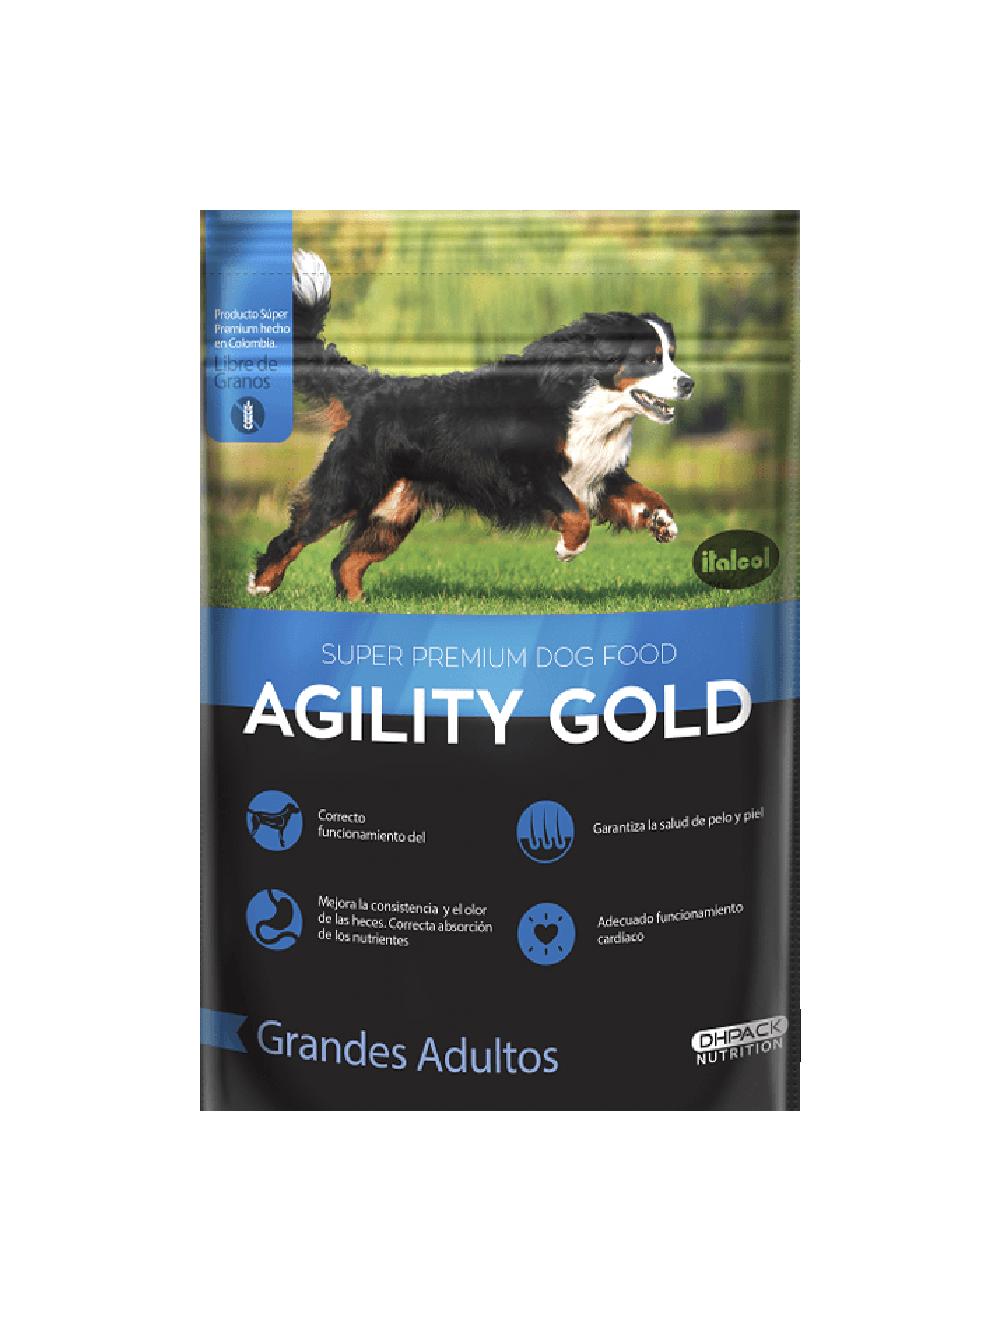 Agility Gold Grandes Adultos 1.5 Kg - Ciudaddemascotas.com